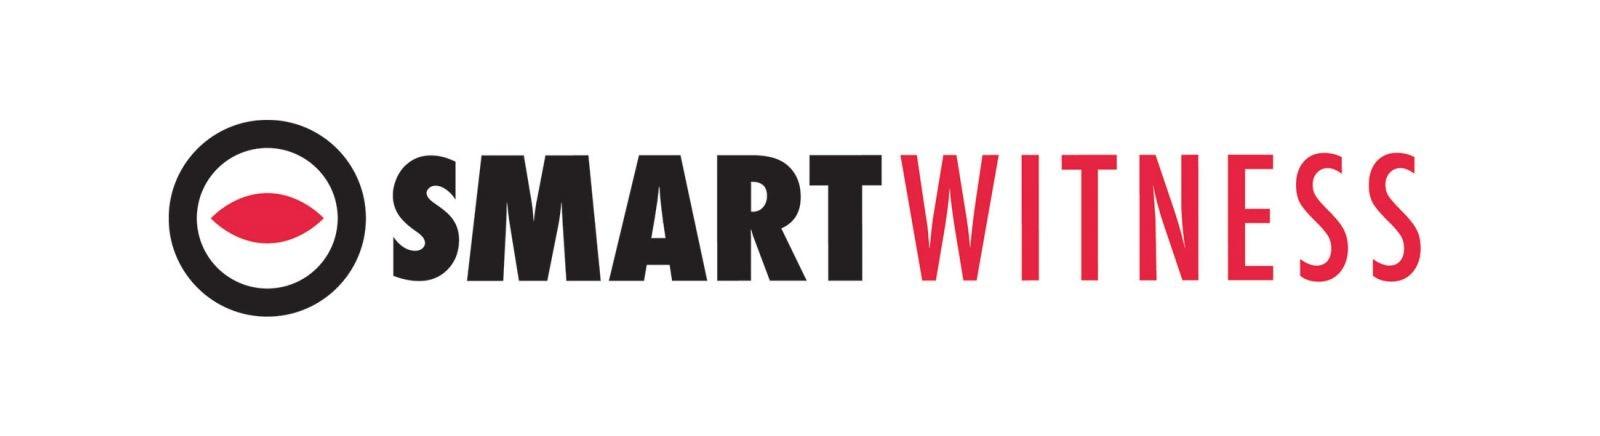 Smart Witness